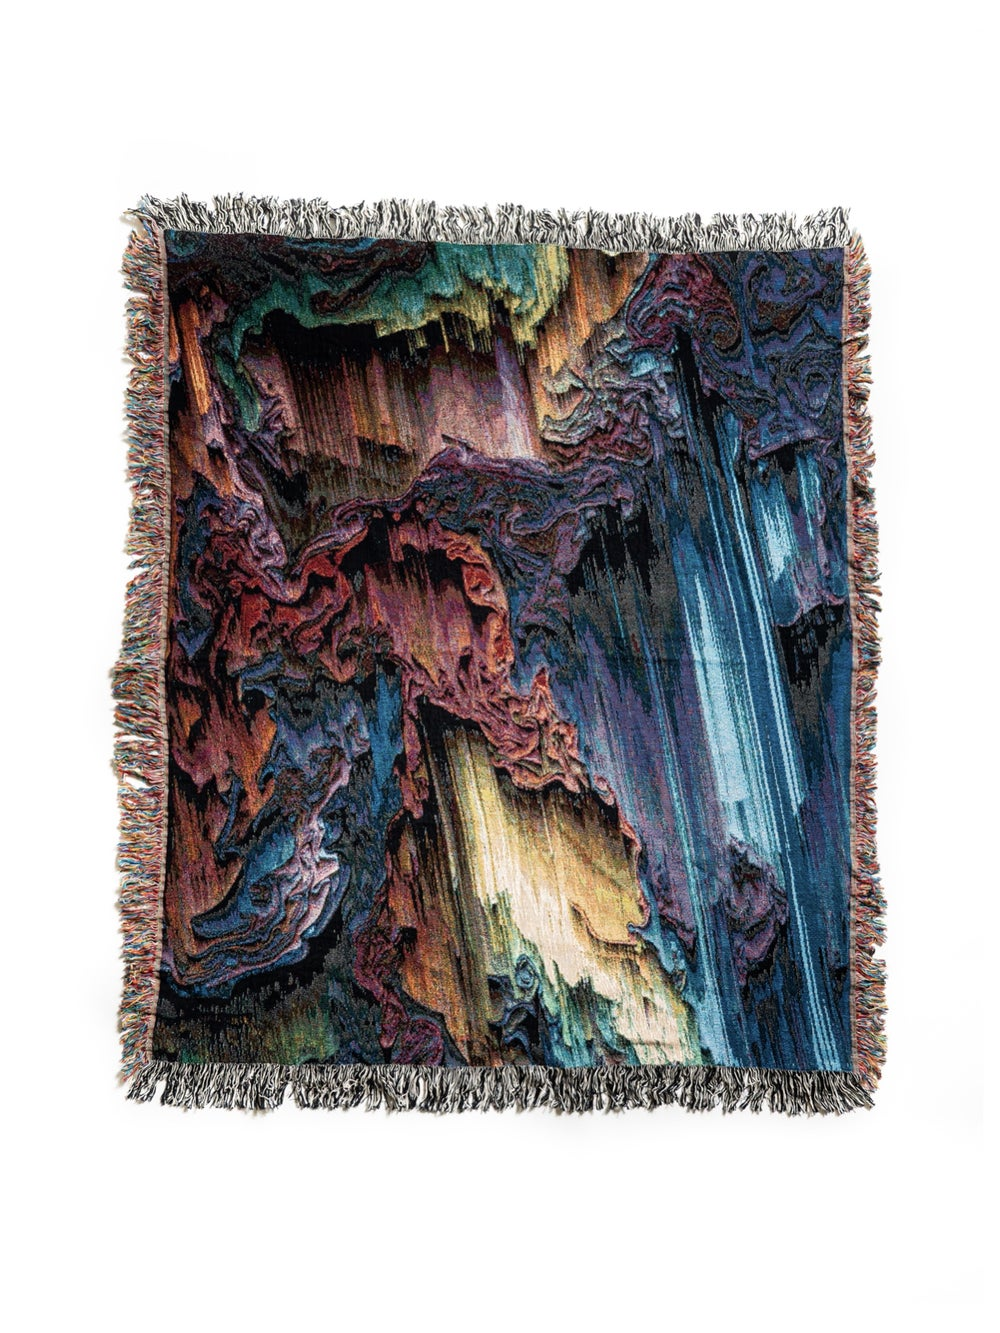 Woven Blanket #36